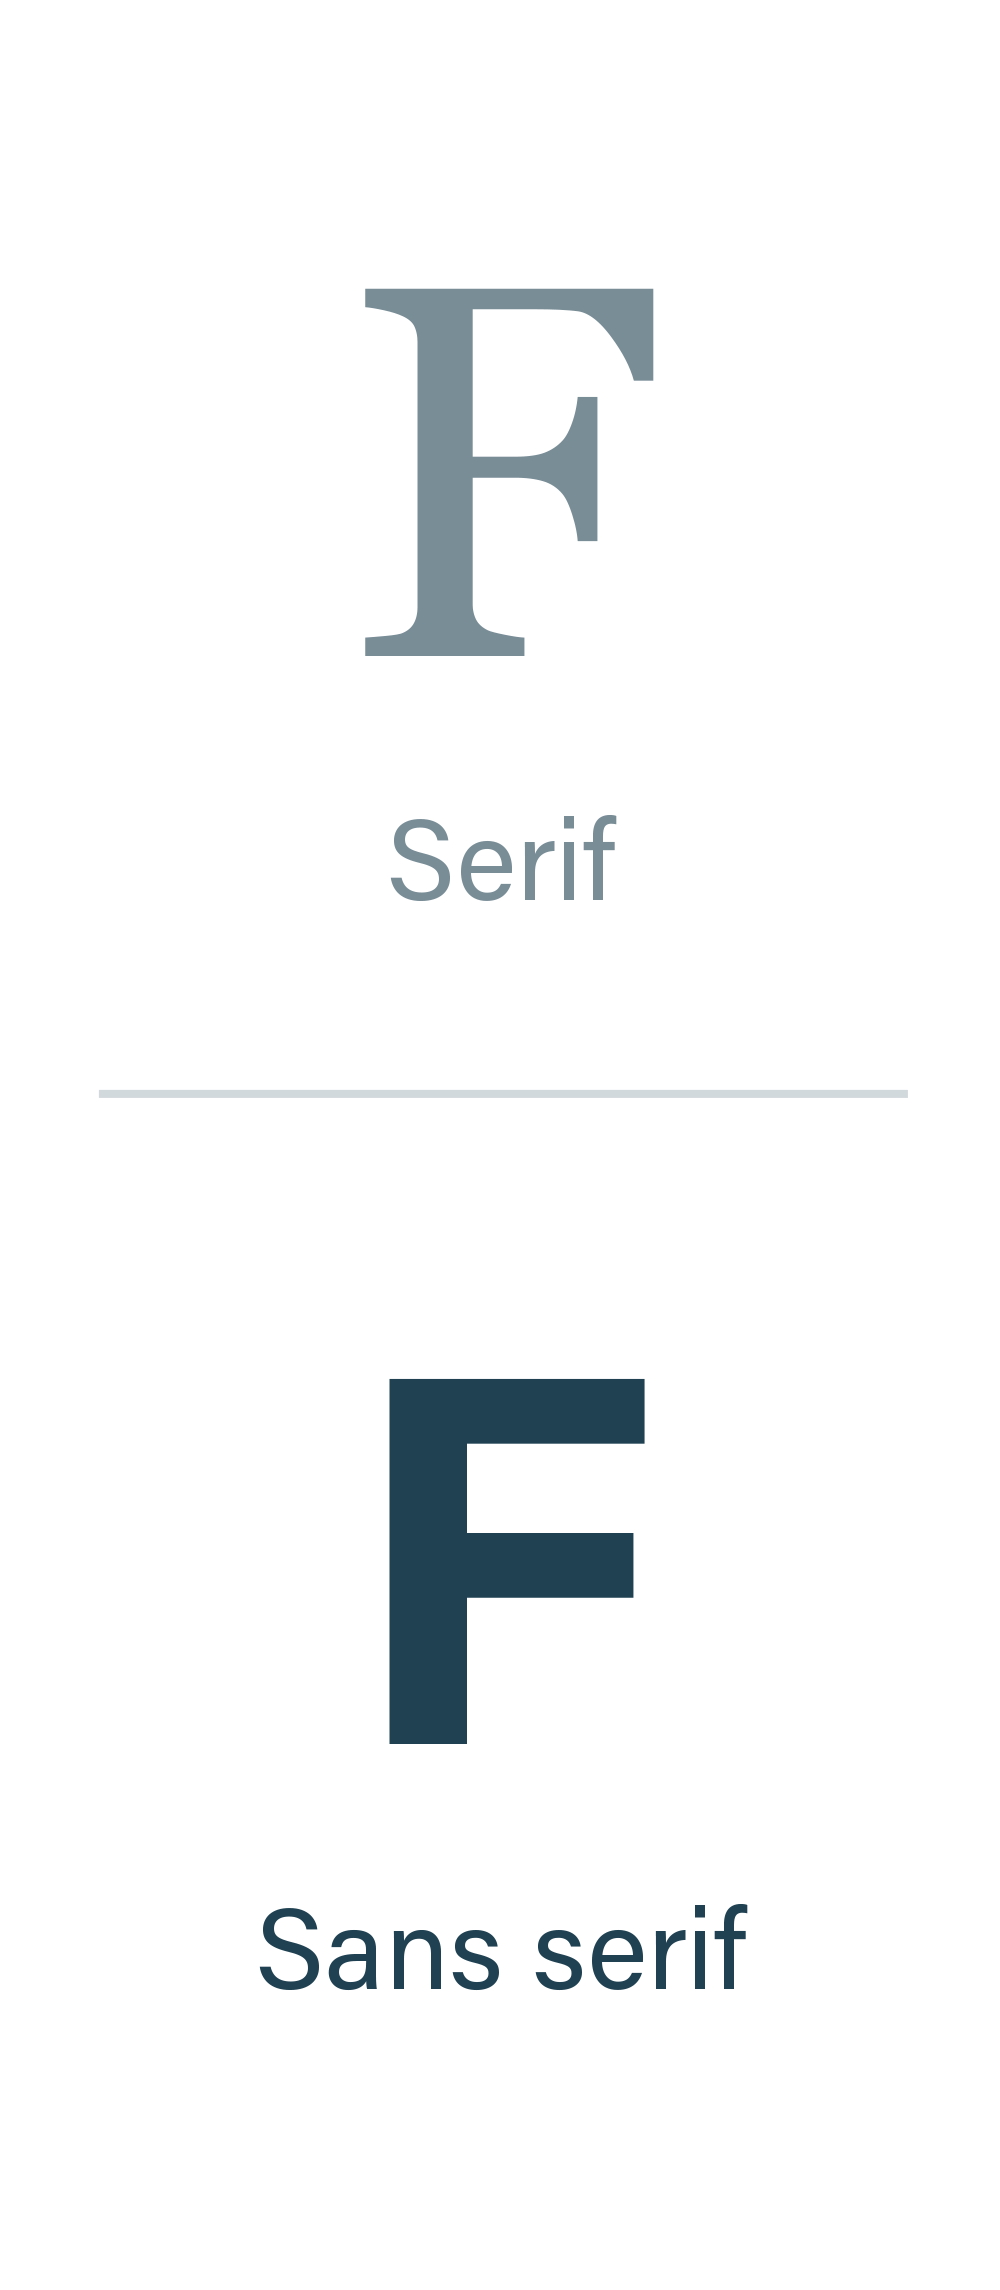 Serif font verses Sans serif font